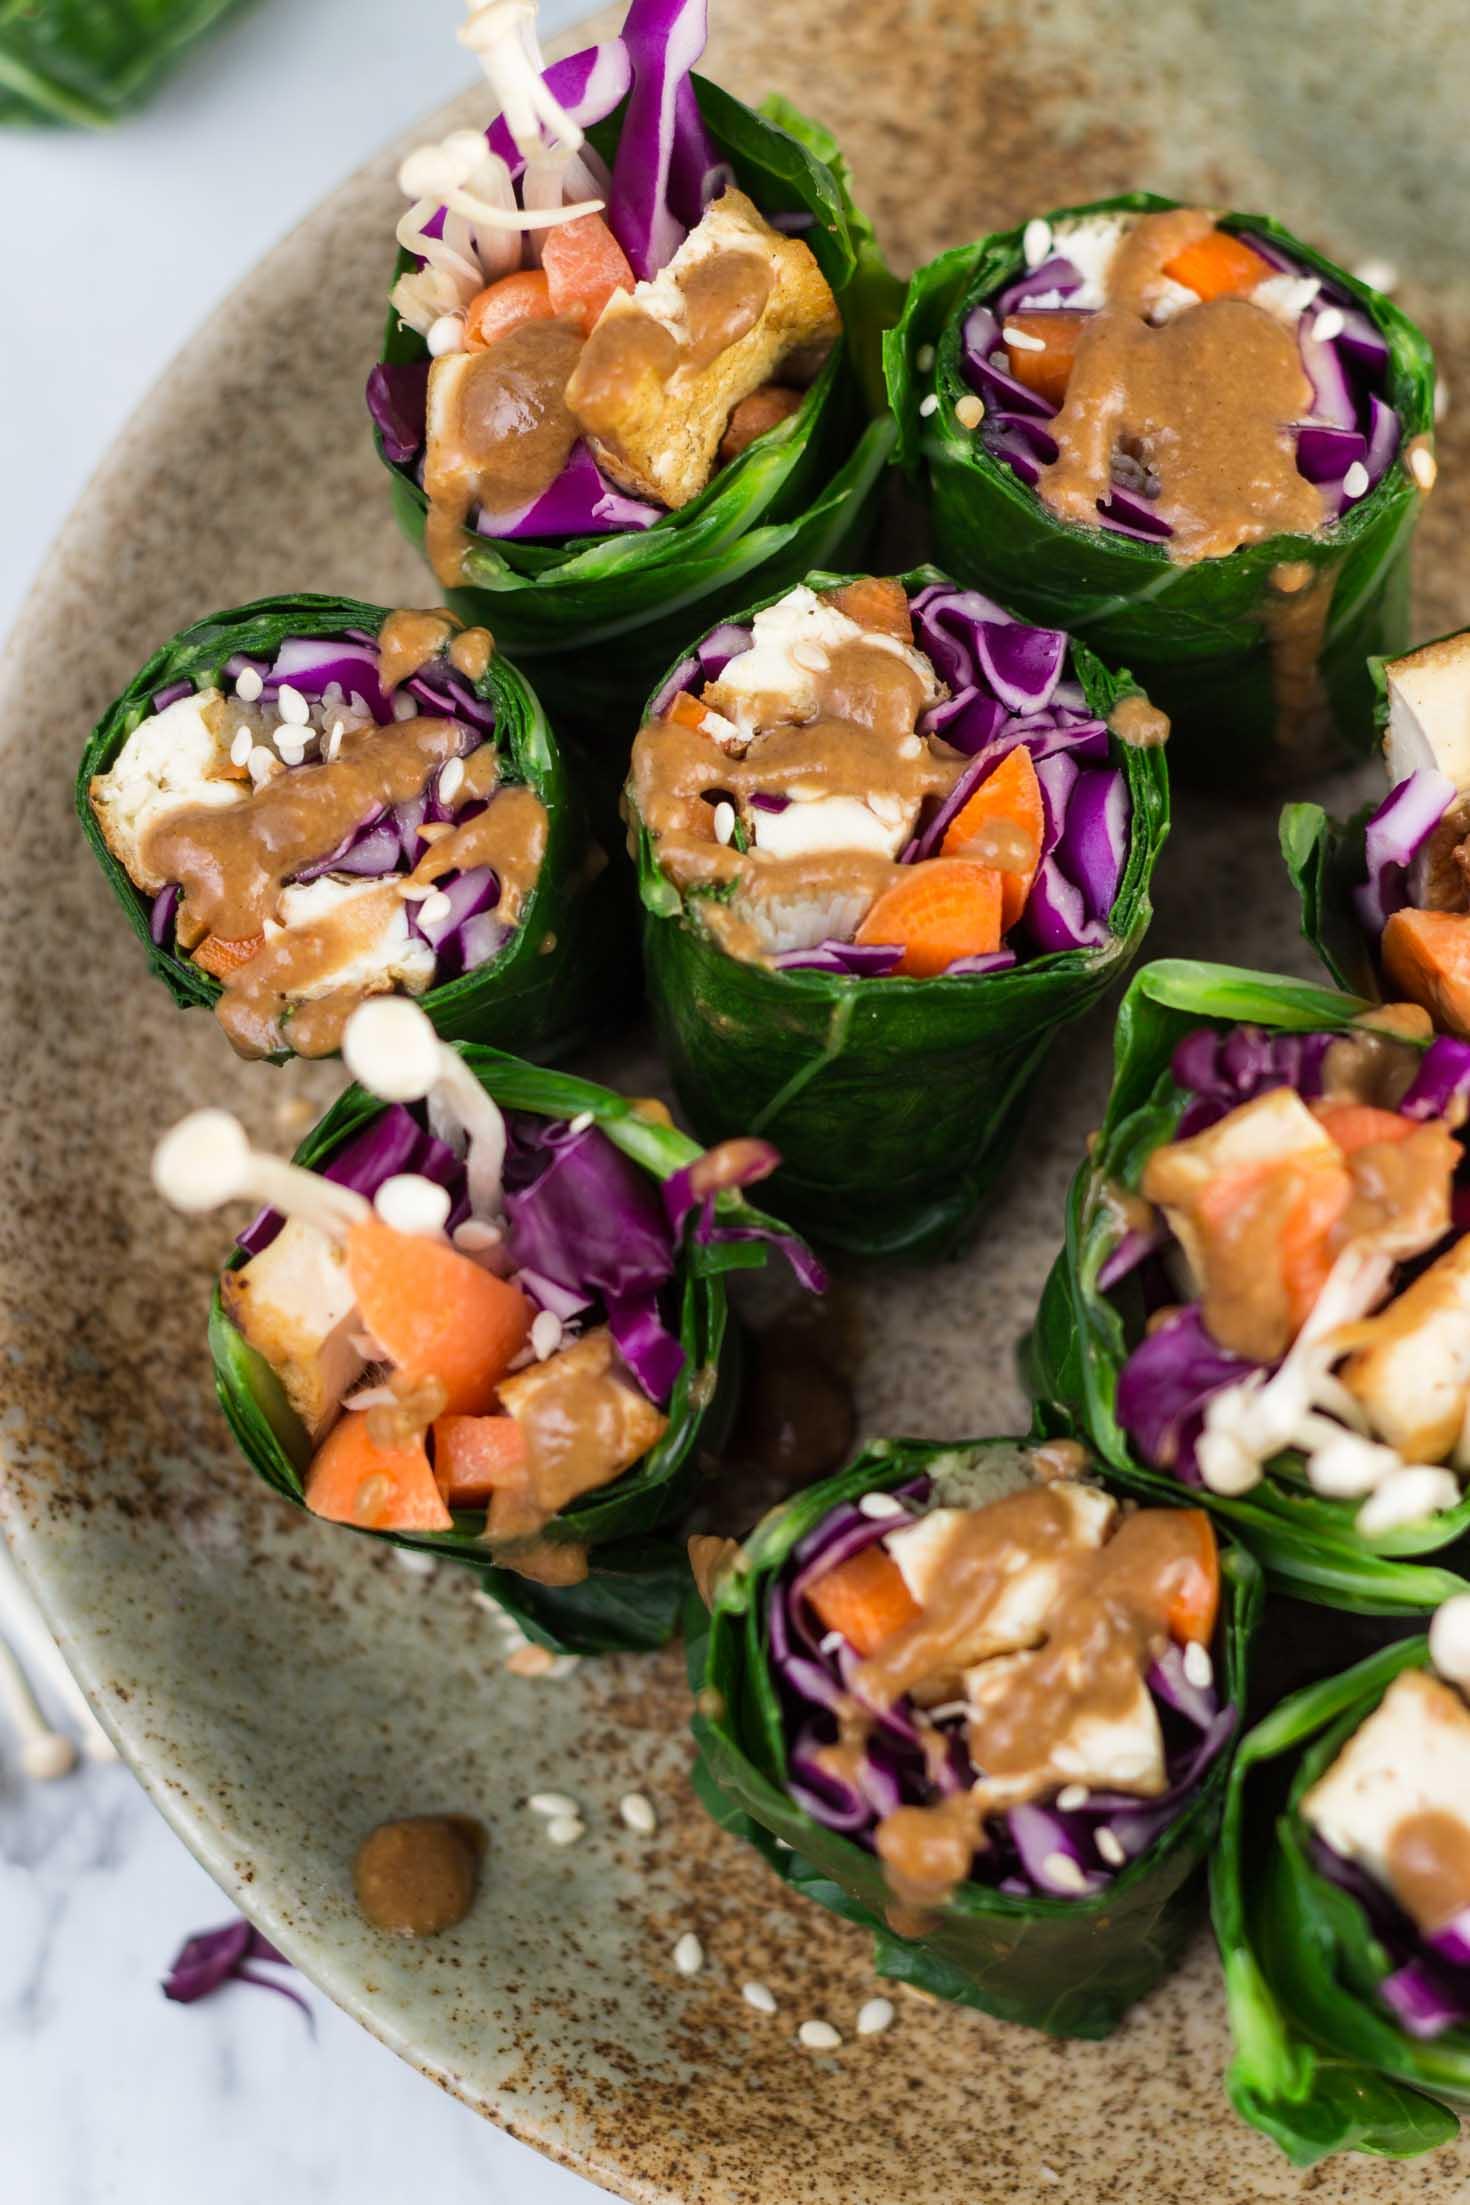 Grain-free Collard Green Rolls with Roasted Tofu and Enoki Mushrooms-close up top view